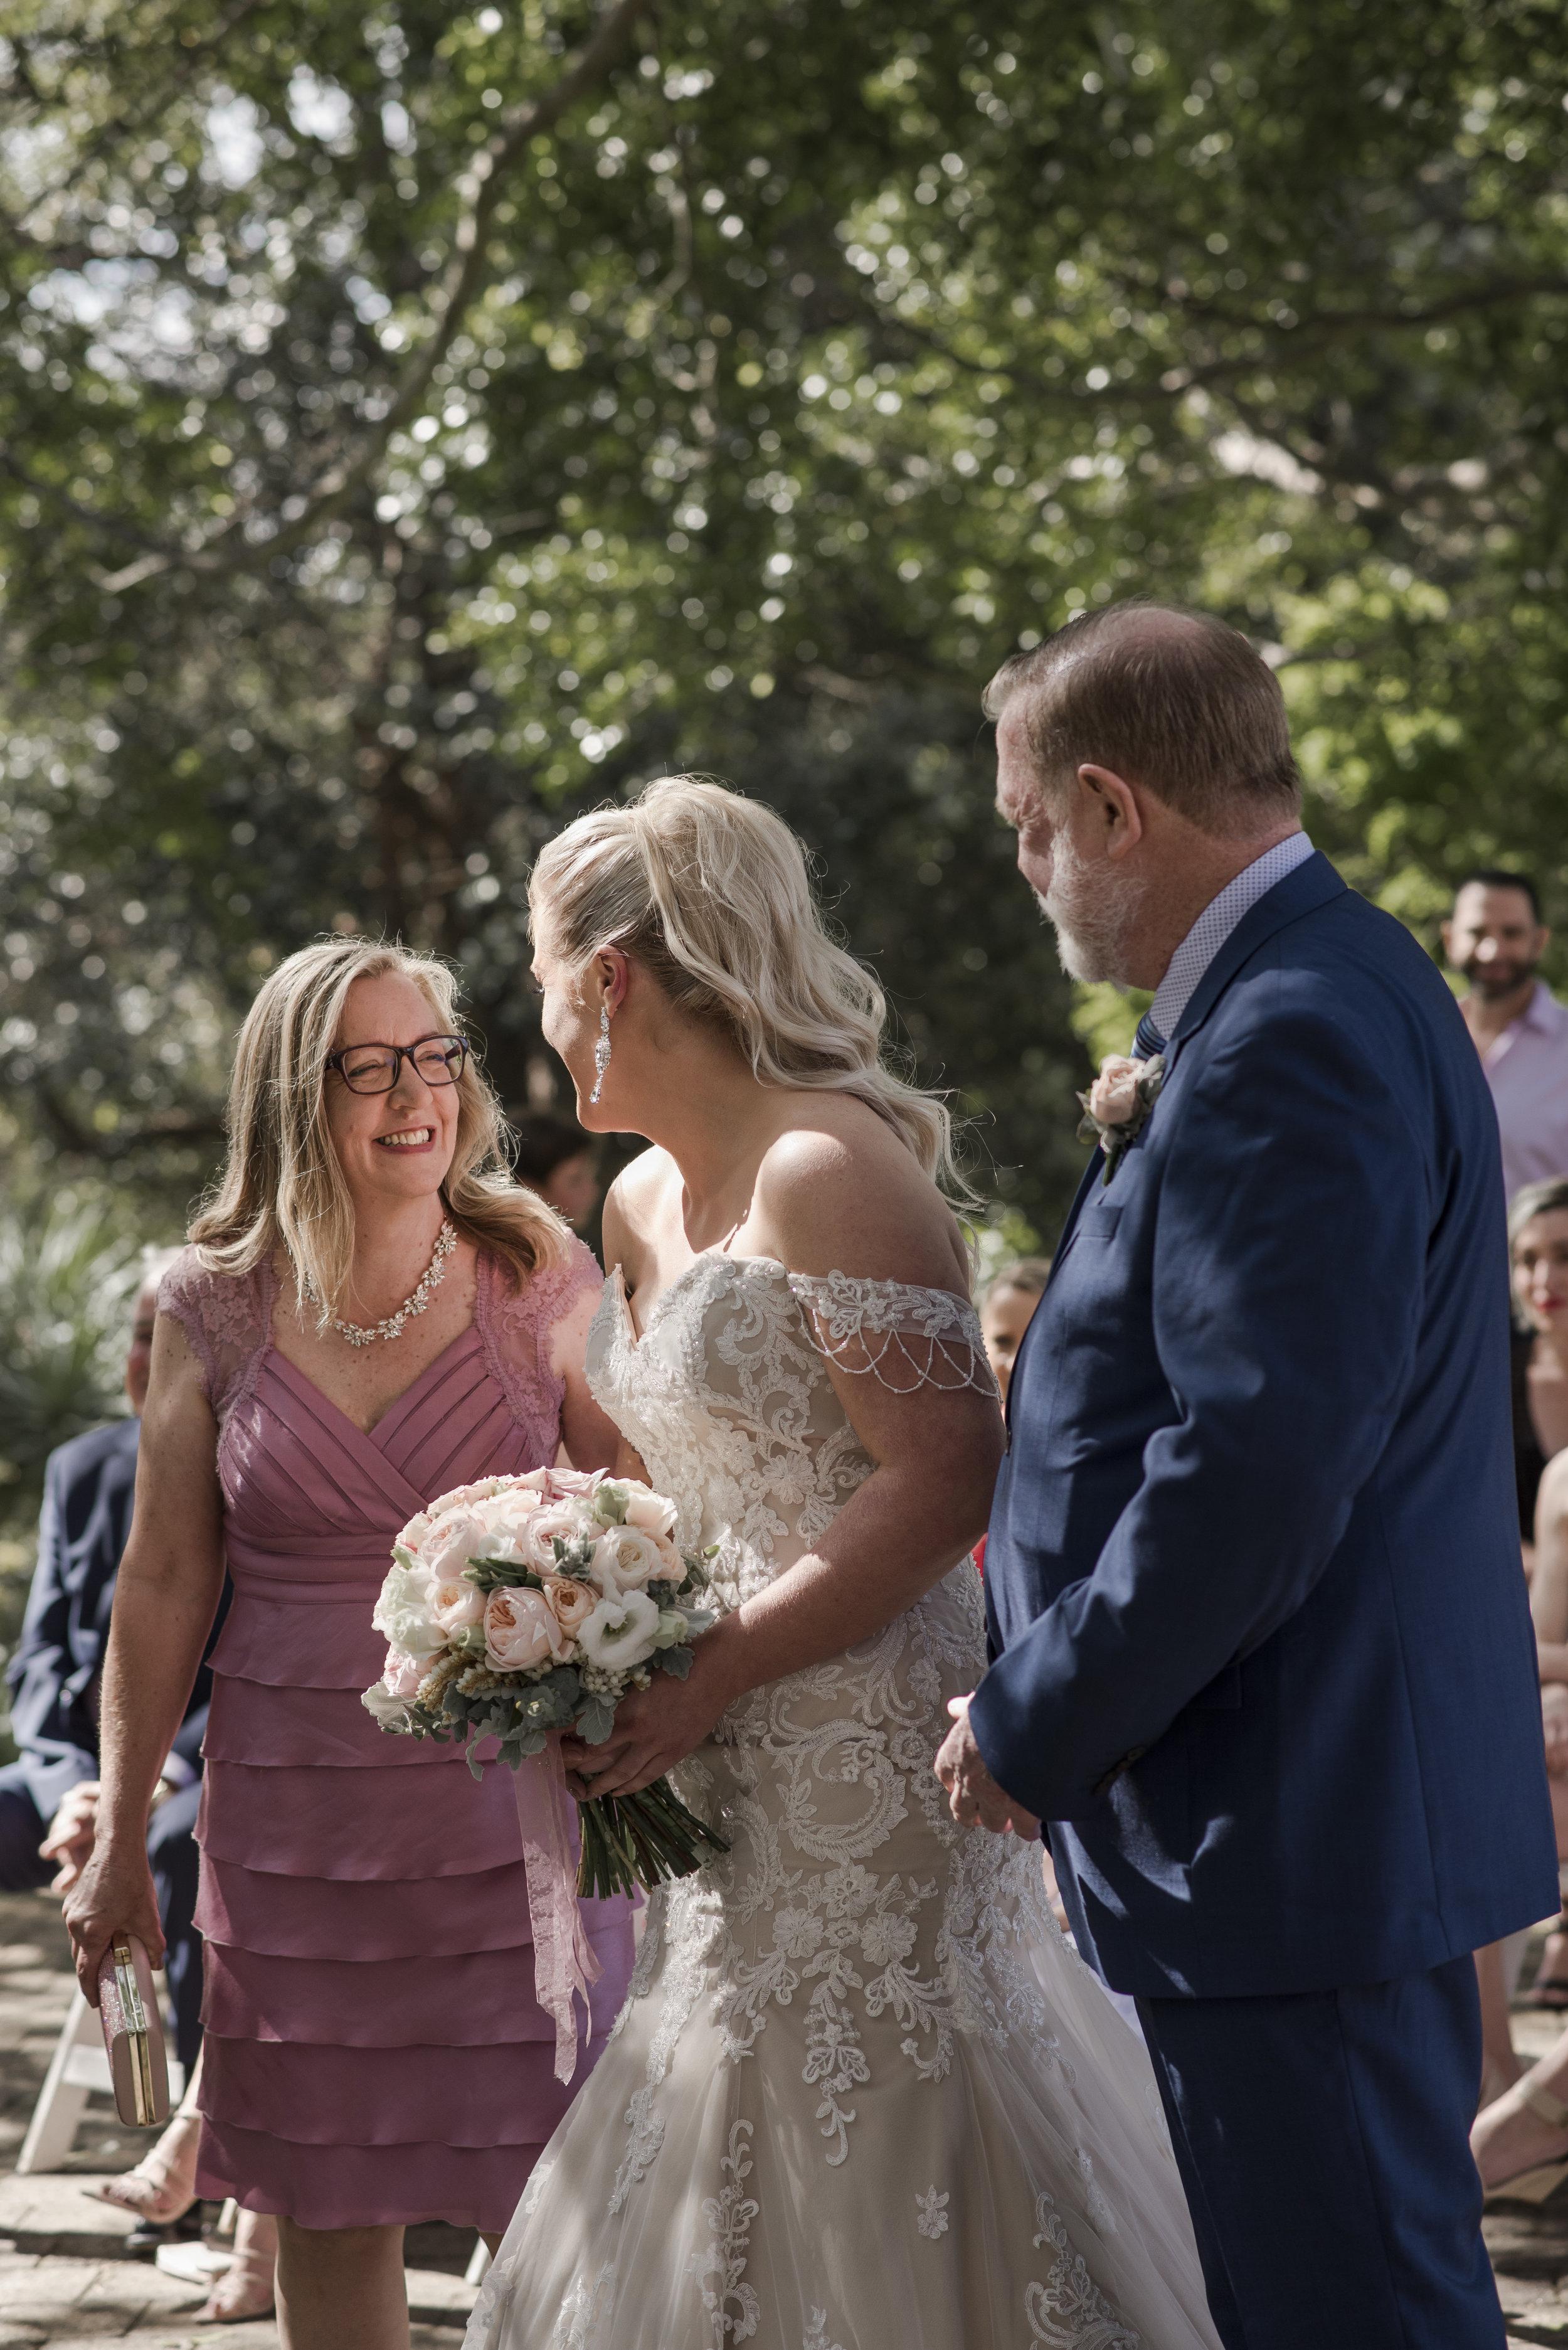 Teagan_Mayflower Weddings Photography_016.jpg